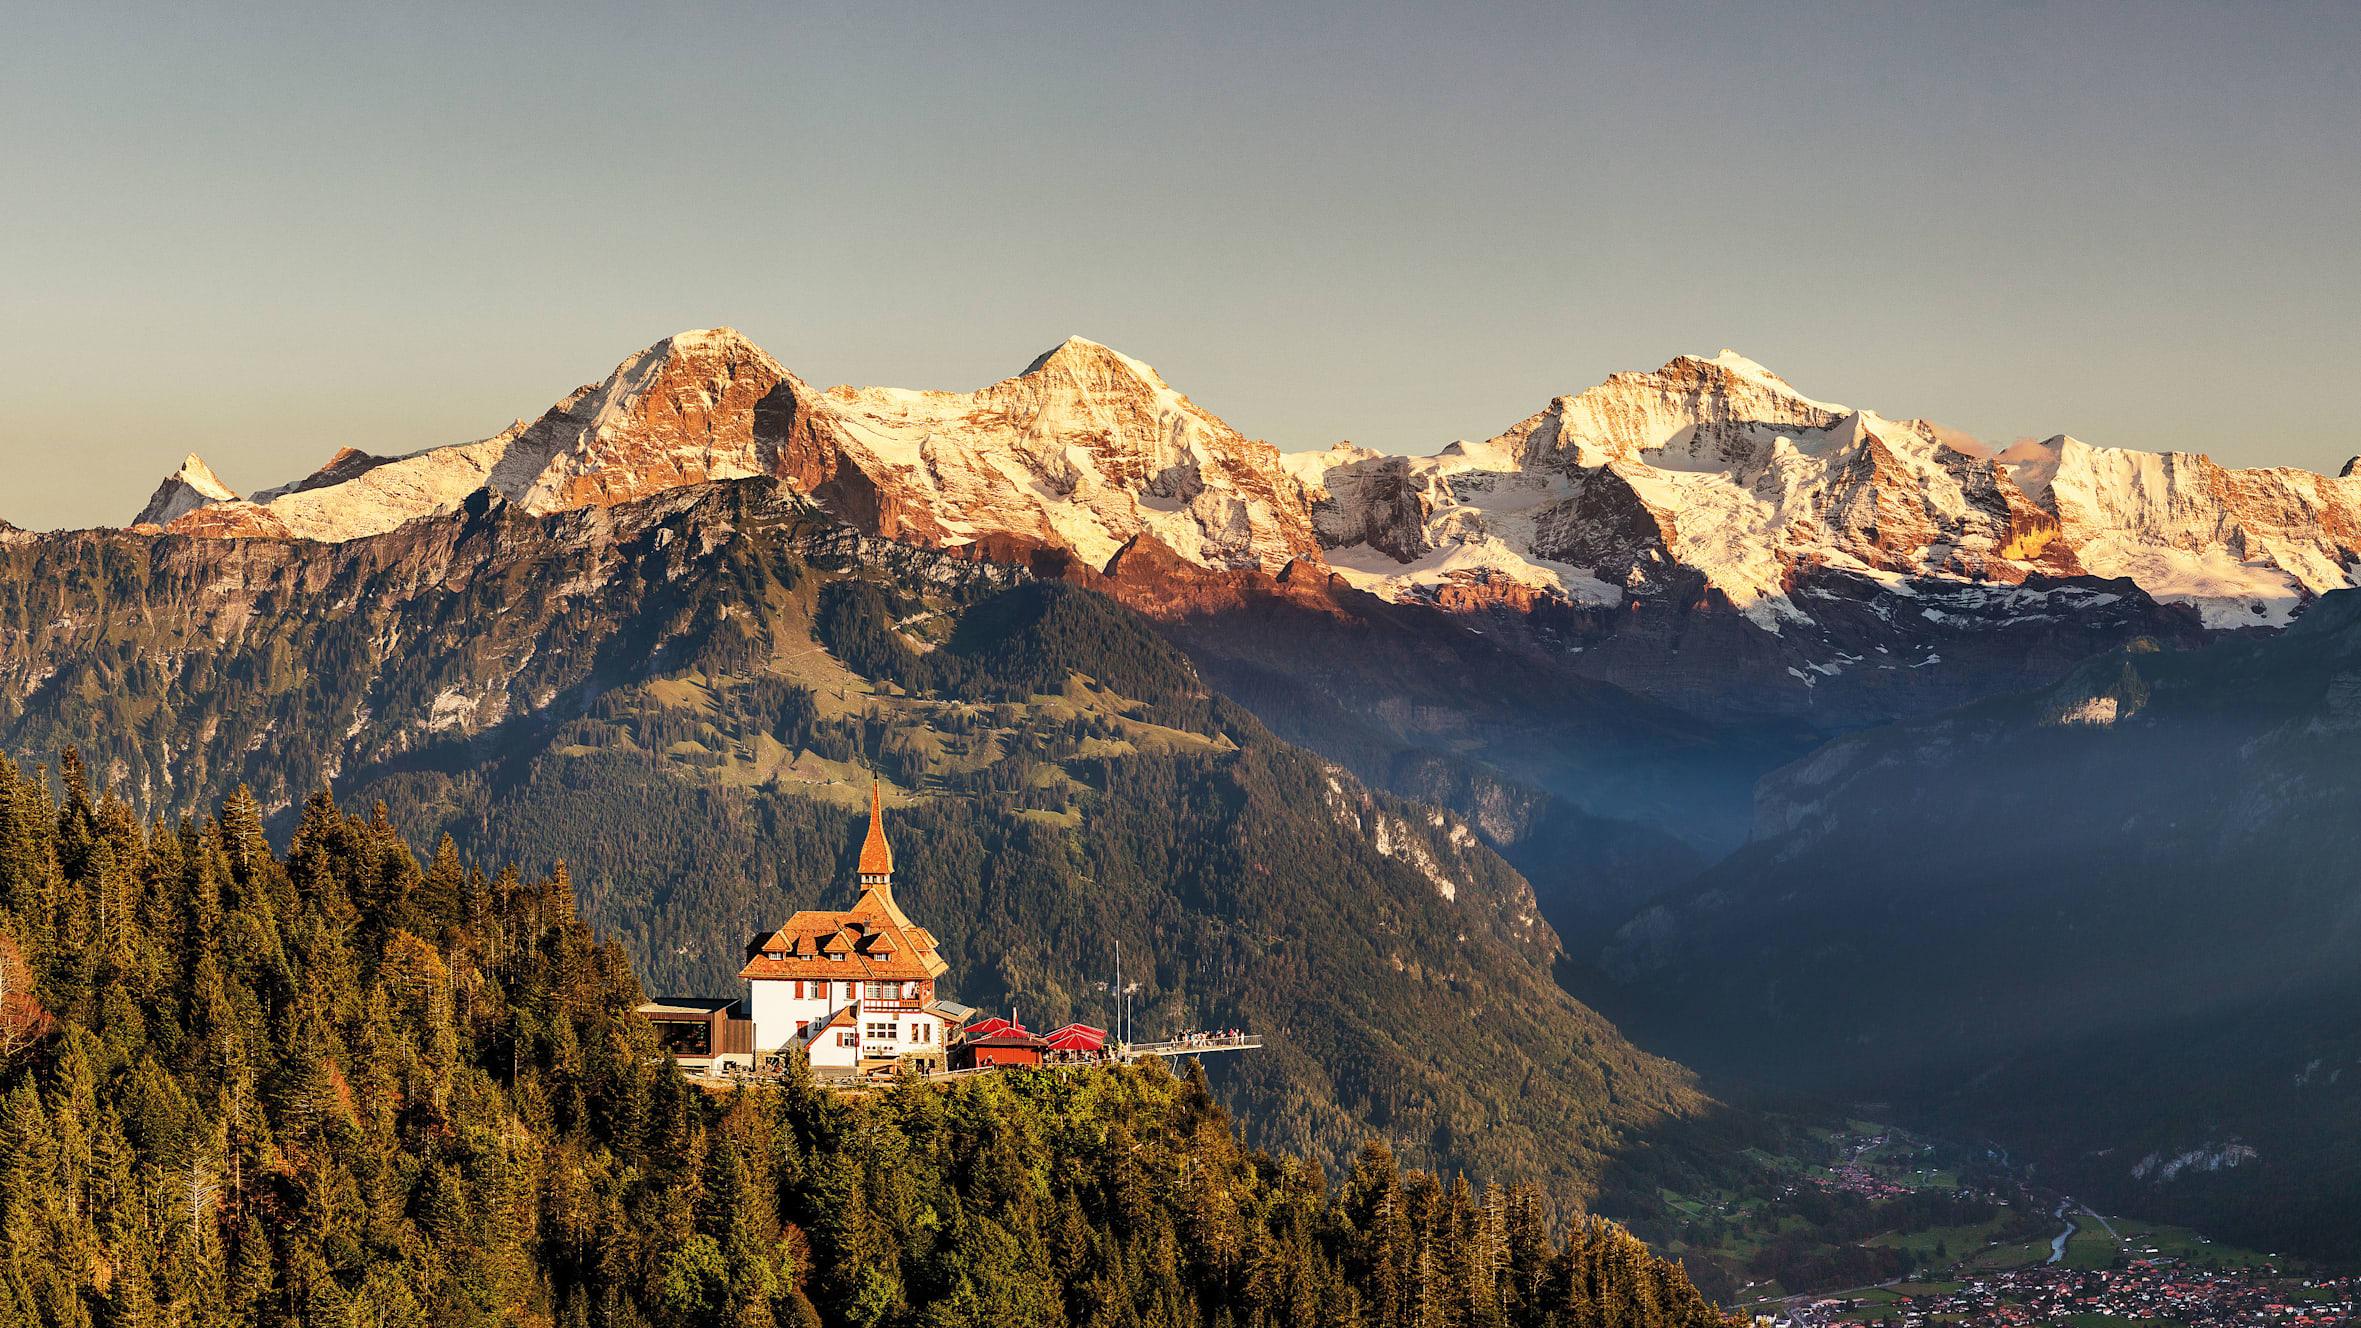 Harder Kulm Panorama Eiger Moench Jungfrau Sonnenuntergang